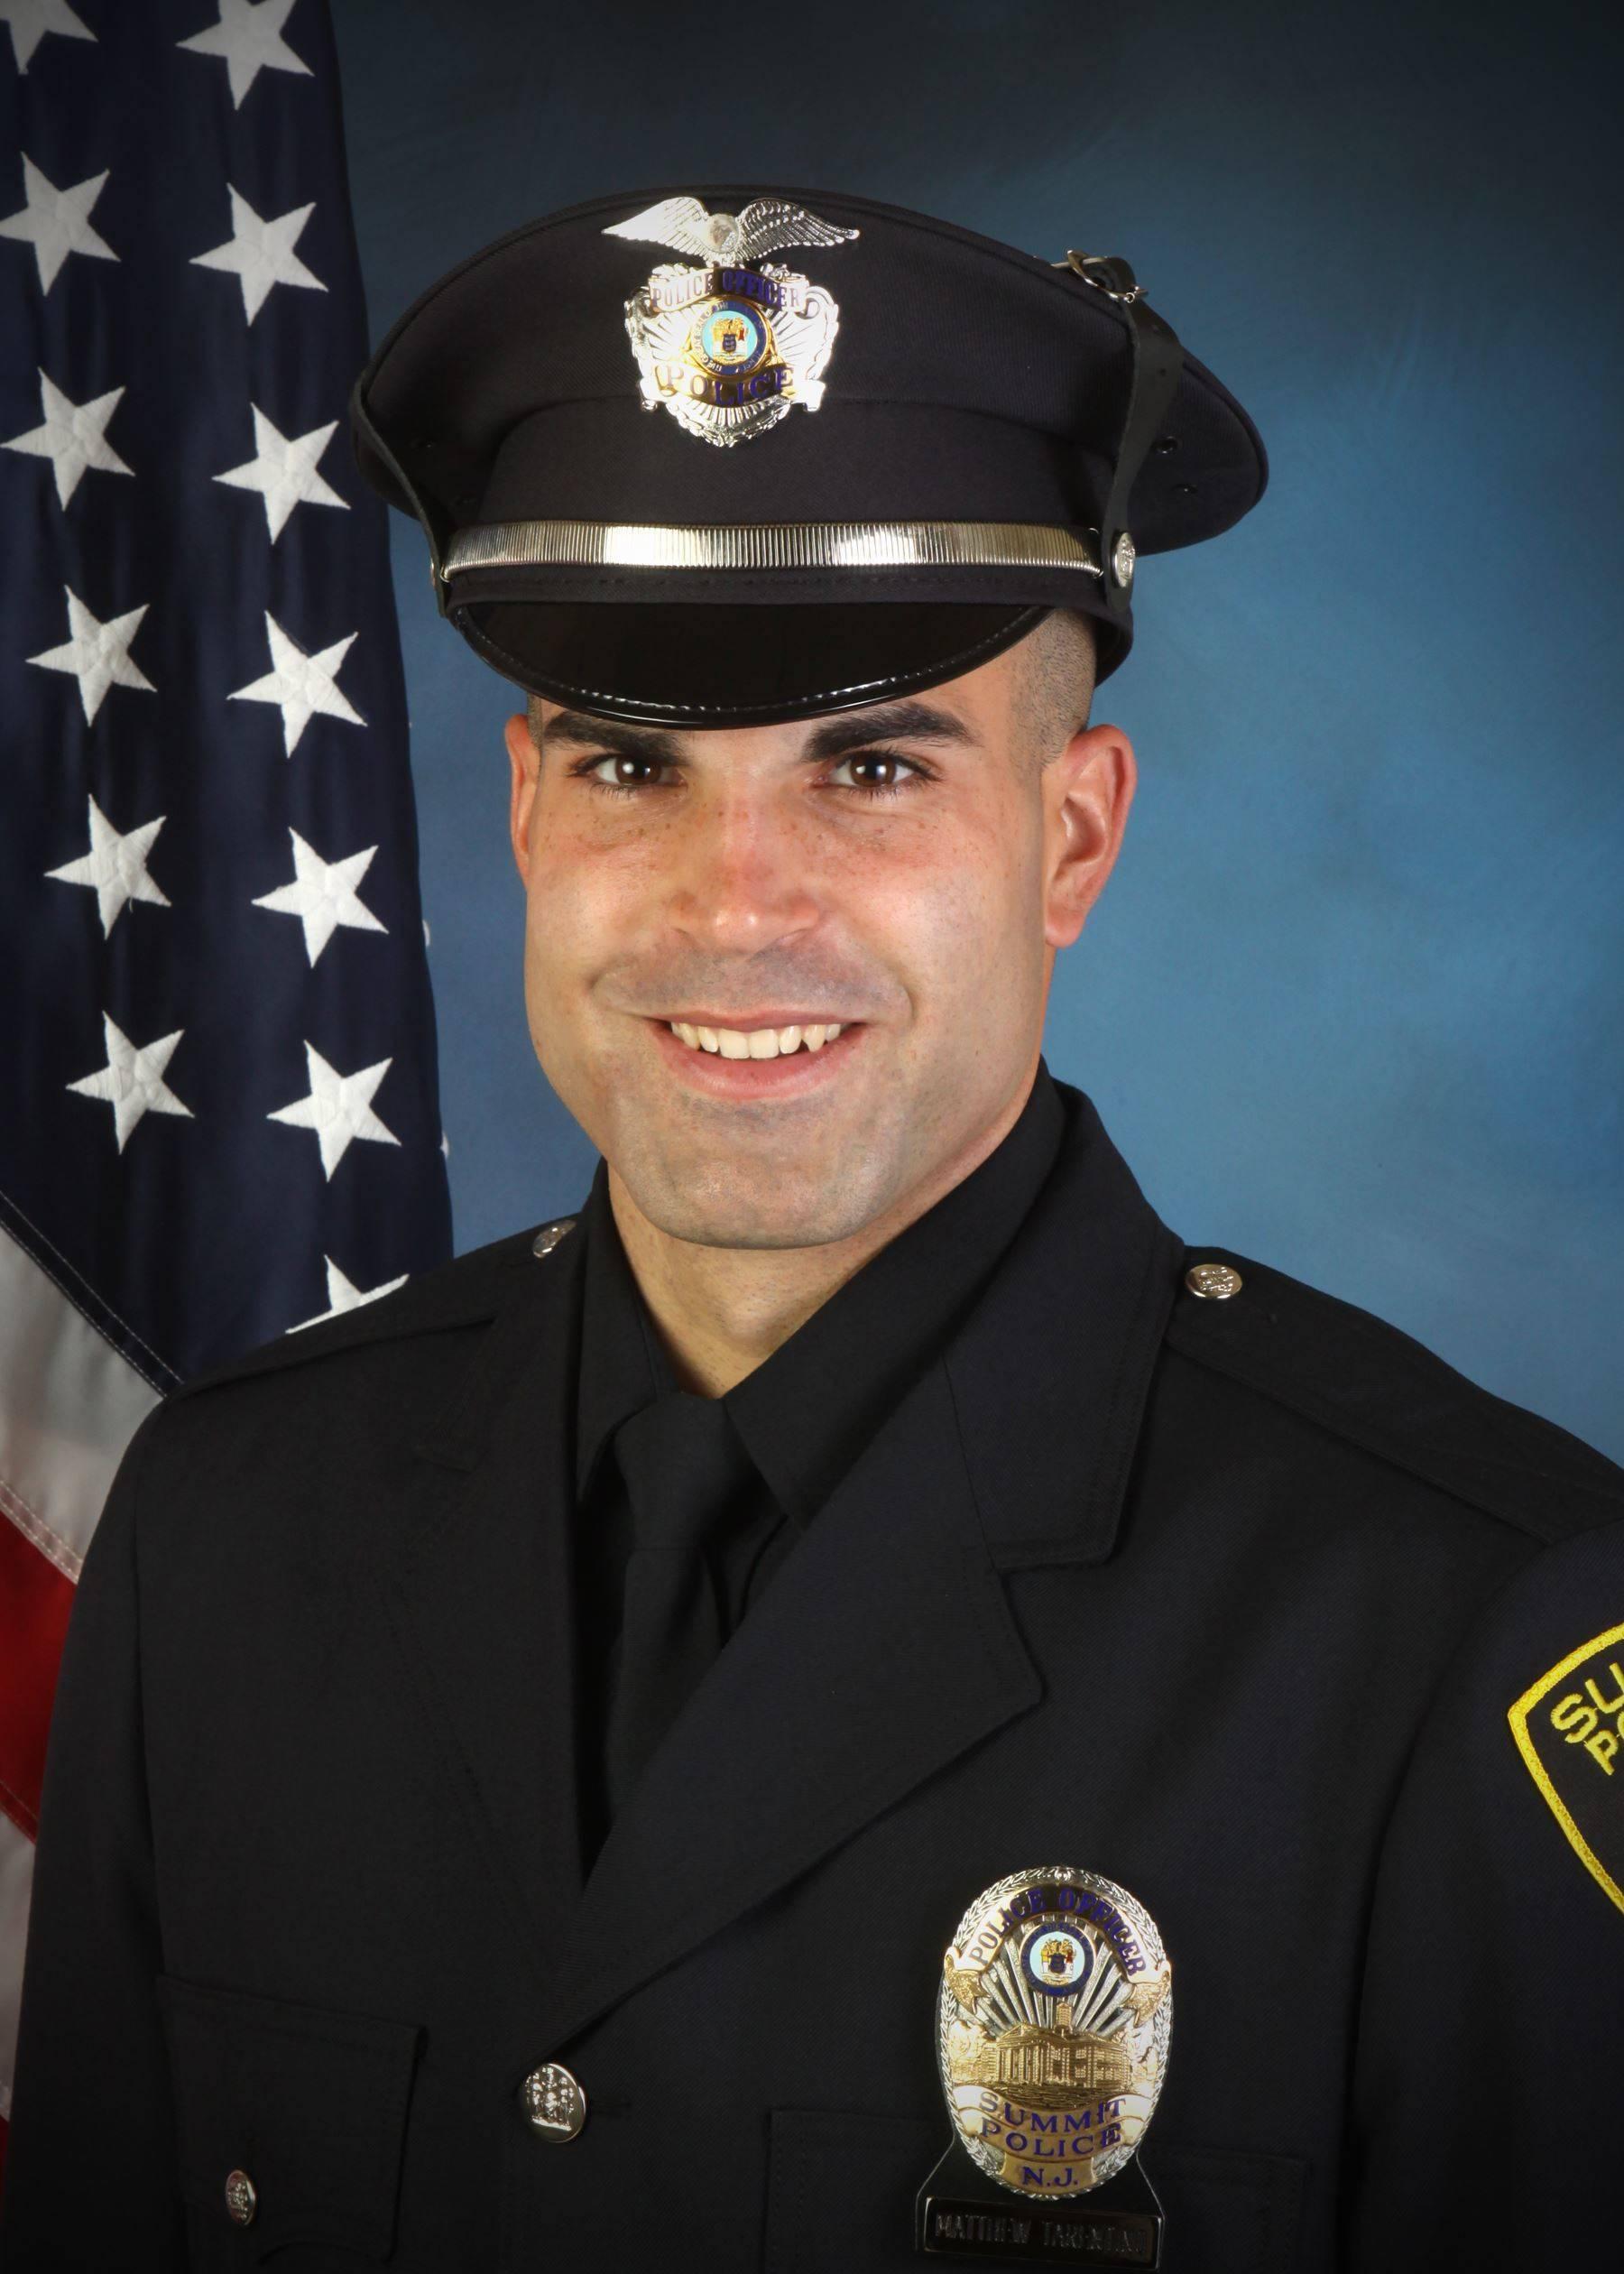 76fe96ca6285833c9079_7c9922489cc9c9366c8e_46_Police_Officer_Matthew_Tarentino.JPG